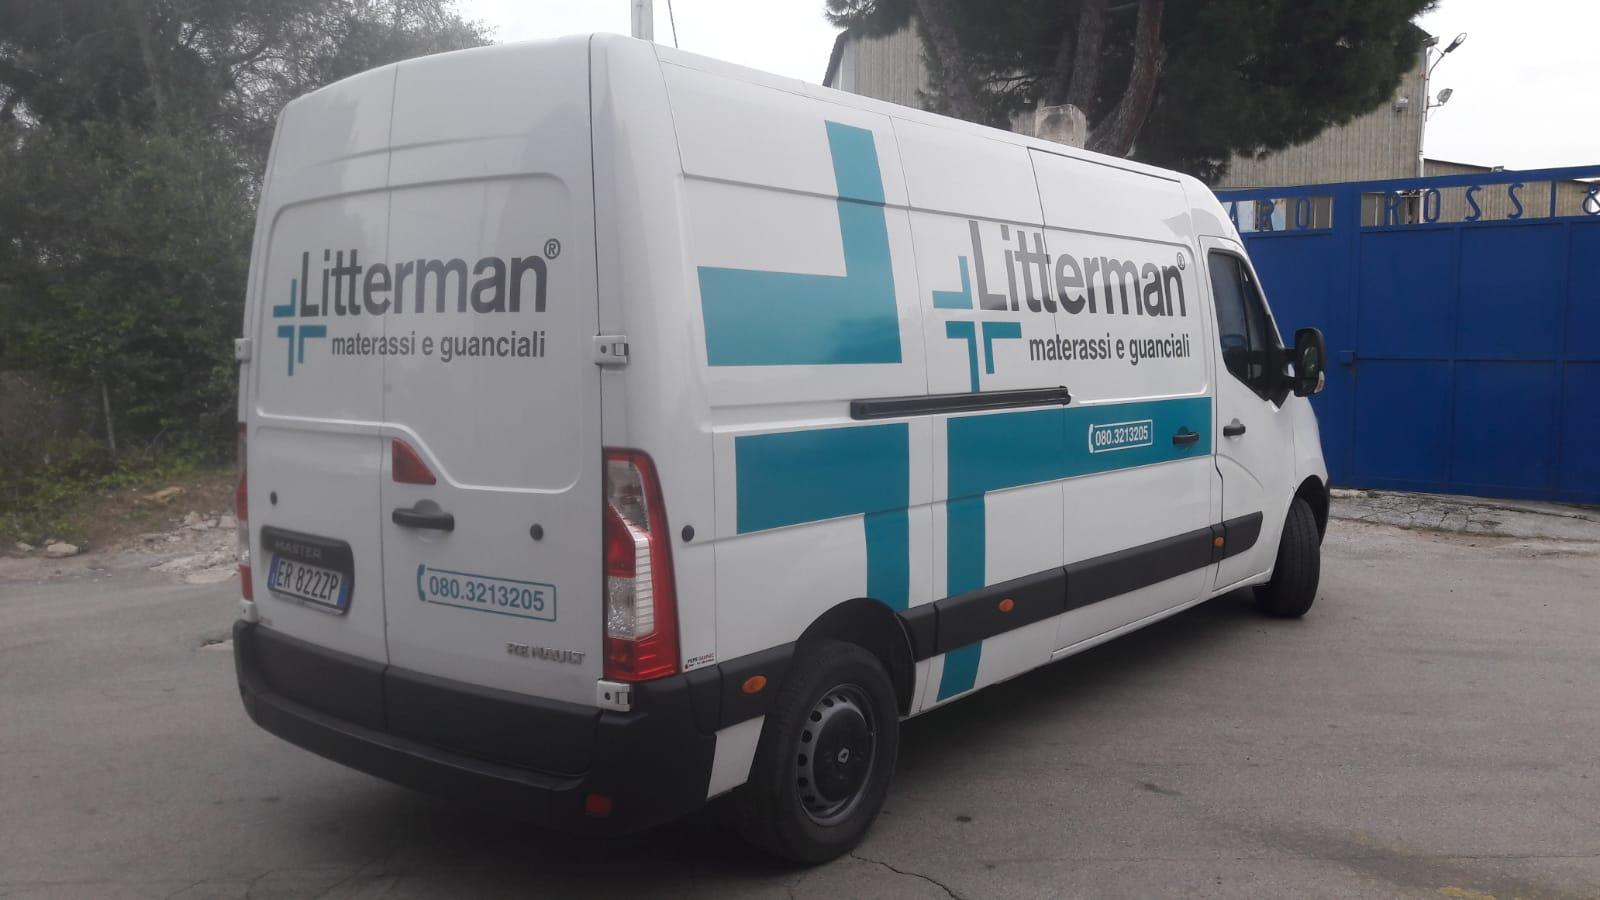 LITTERMAN